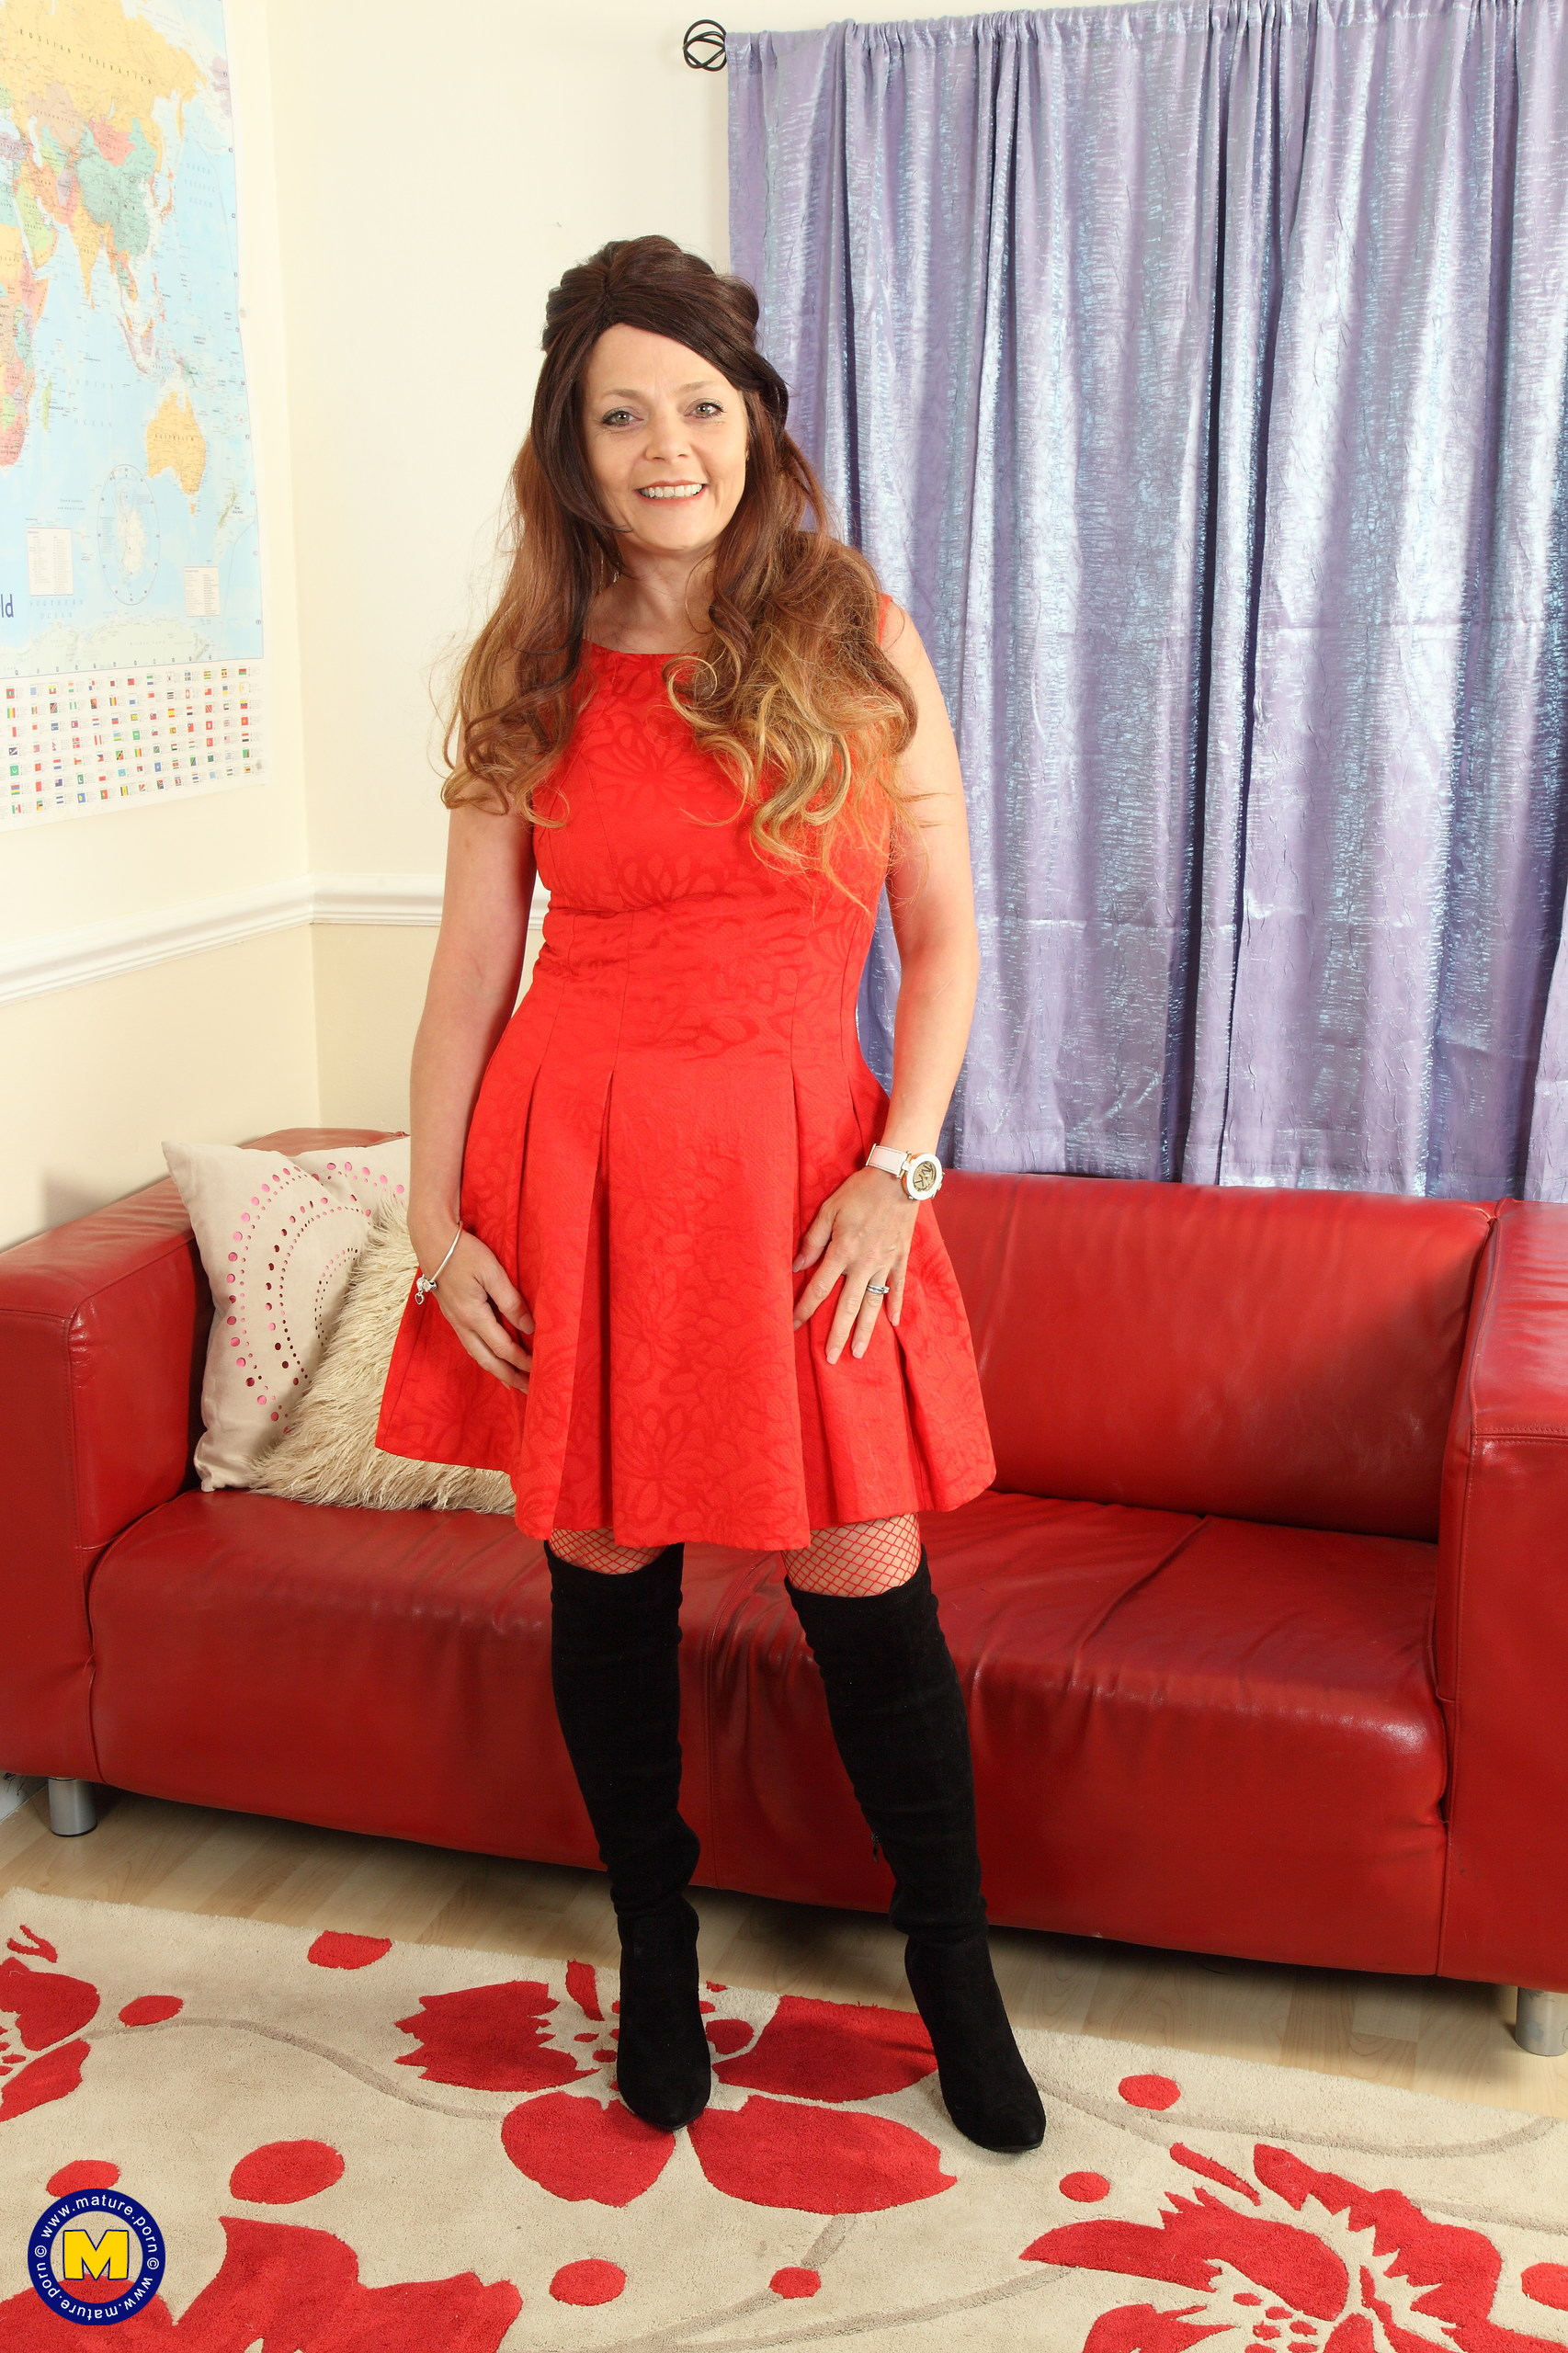 Beautiful British MILF Gemma Gold spreading legs